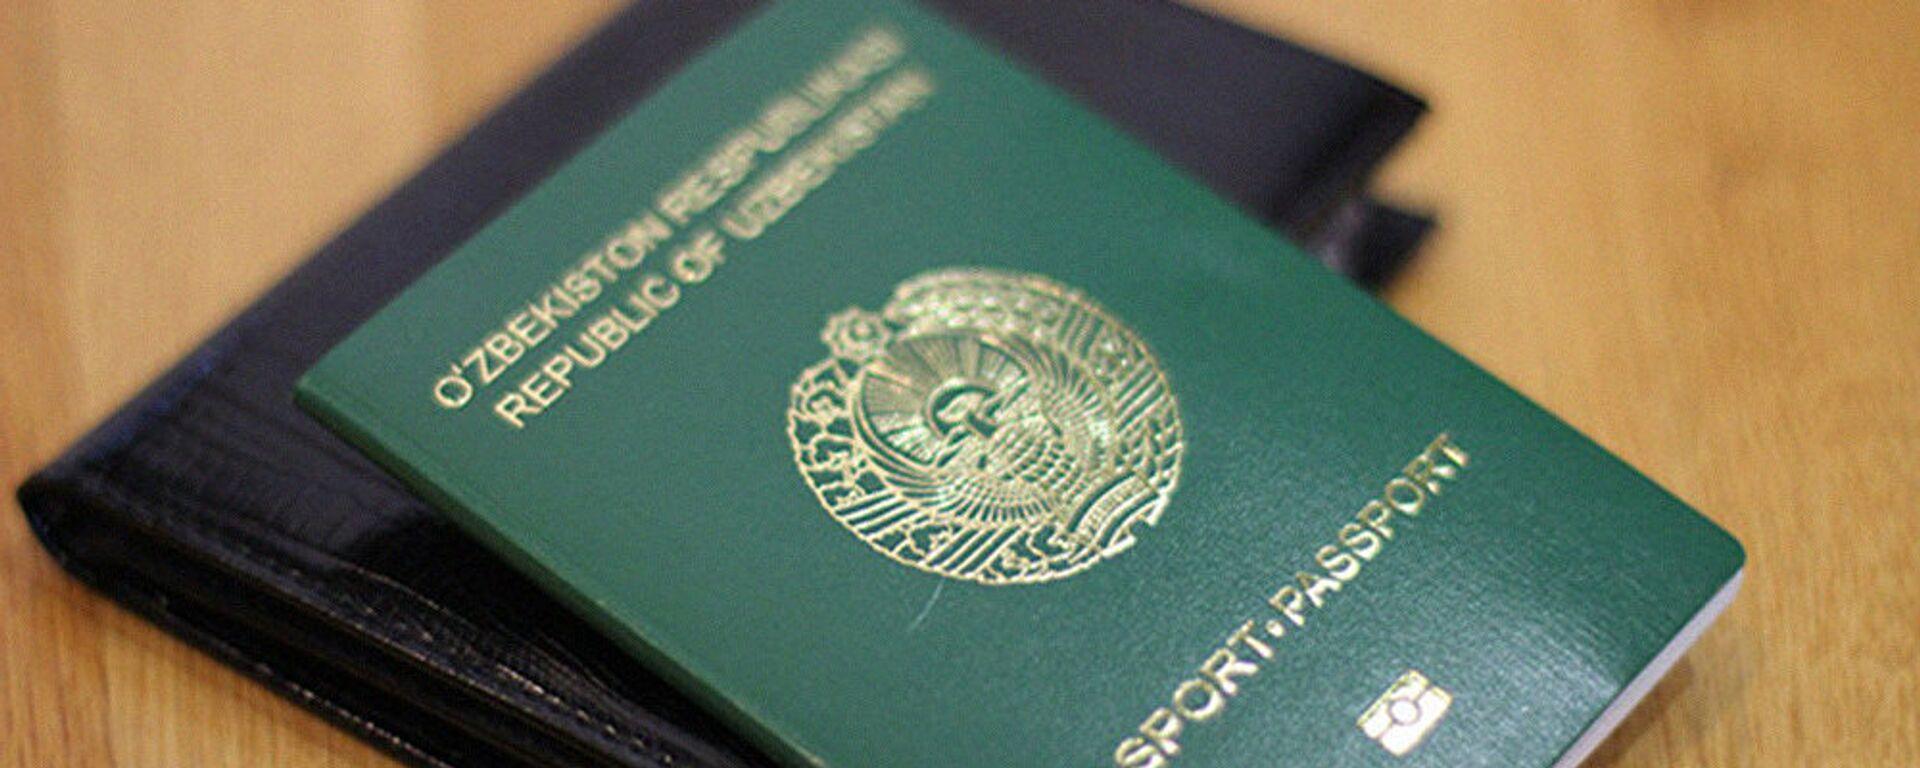 Узбекский паспорт, архивное фото - Sputnik Таджикистан, 1920, 29.05.2021